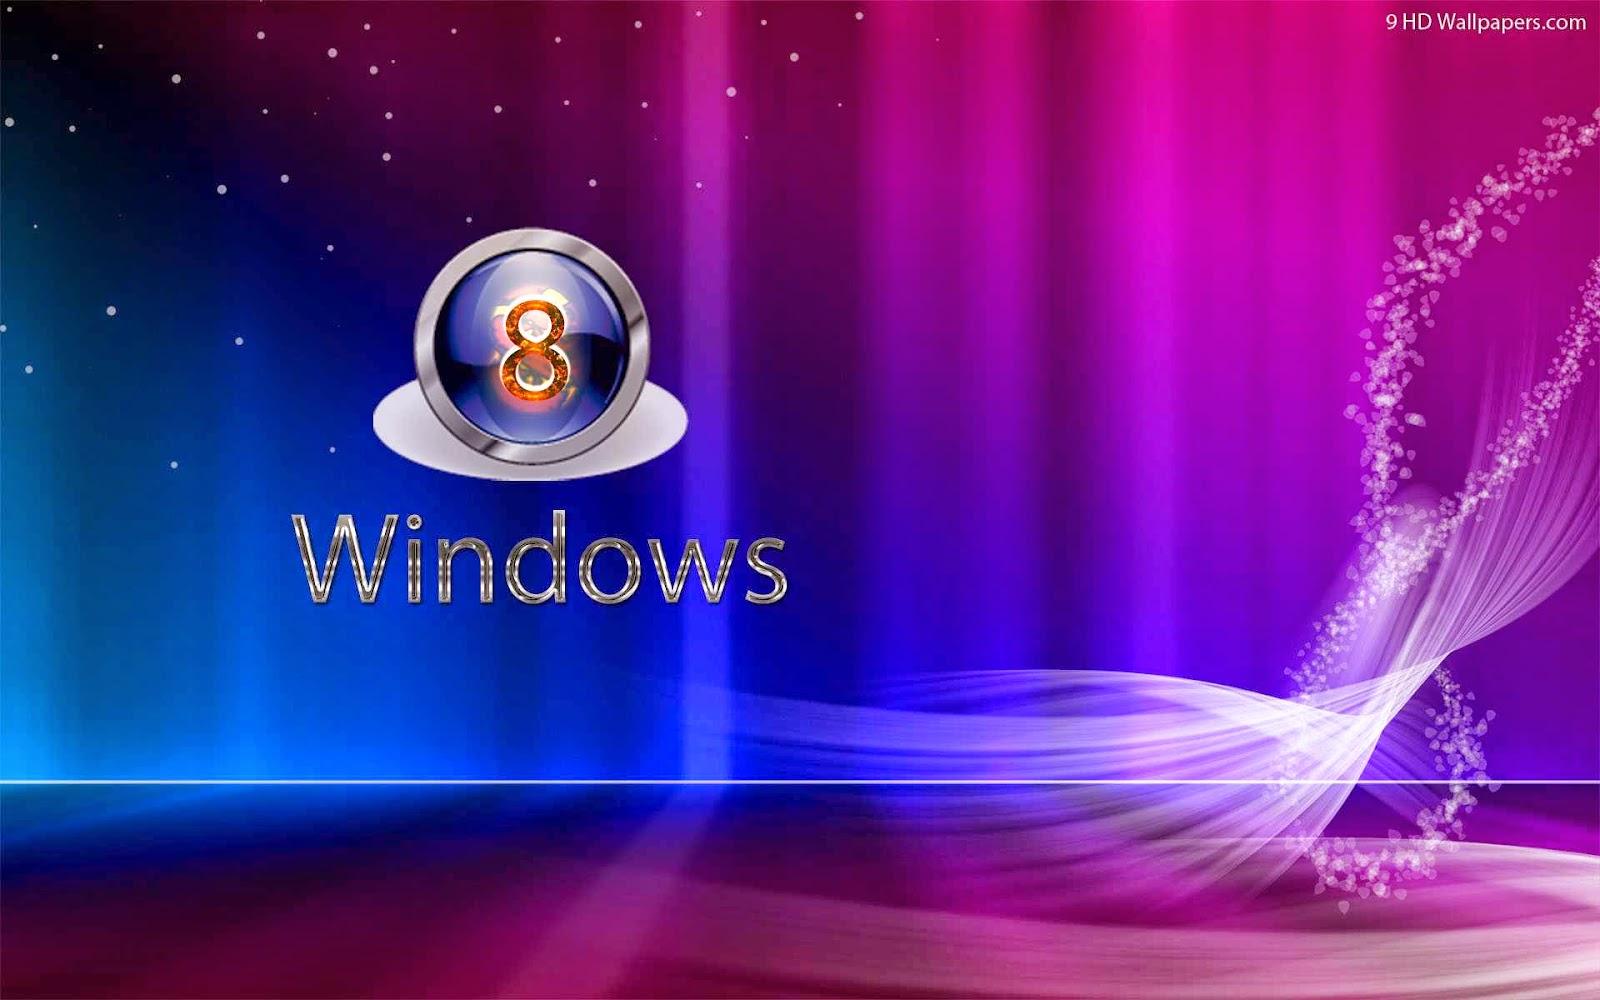 Windows 8 HD Wallpapers free for desktop